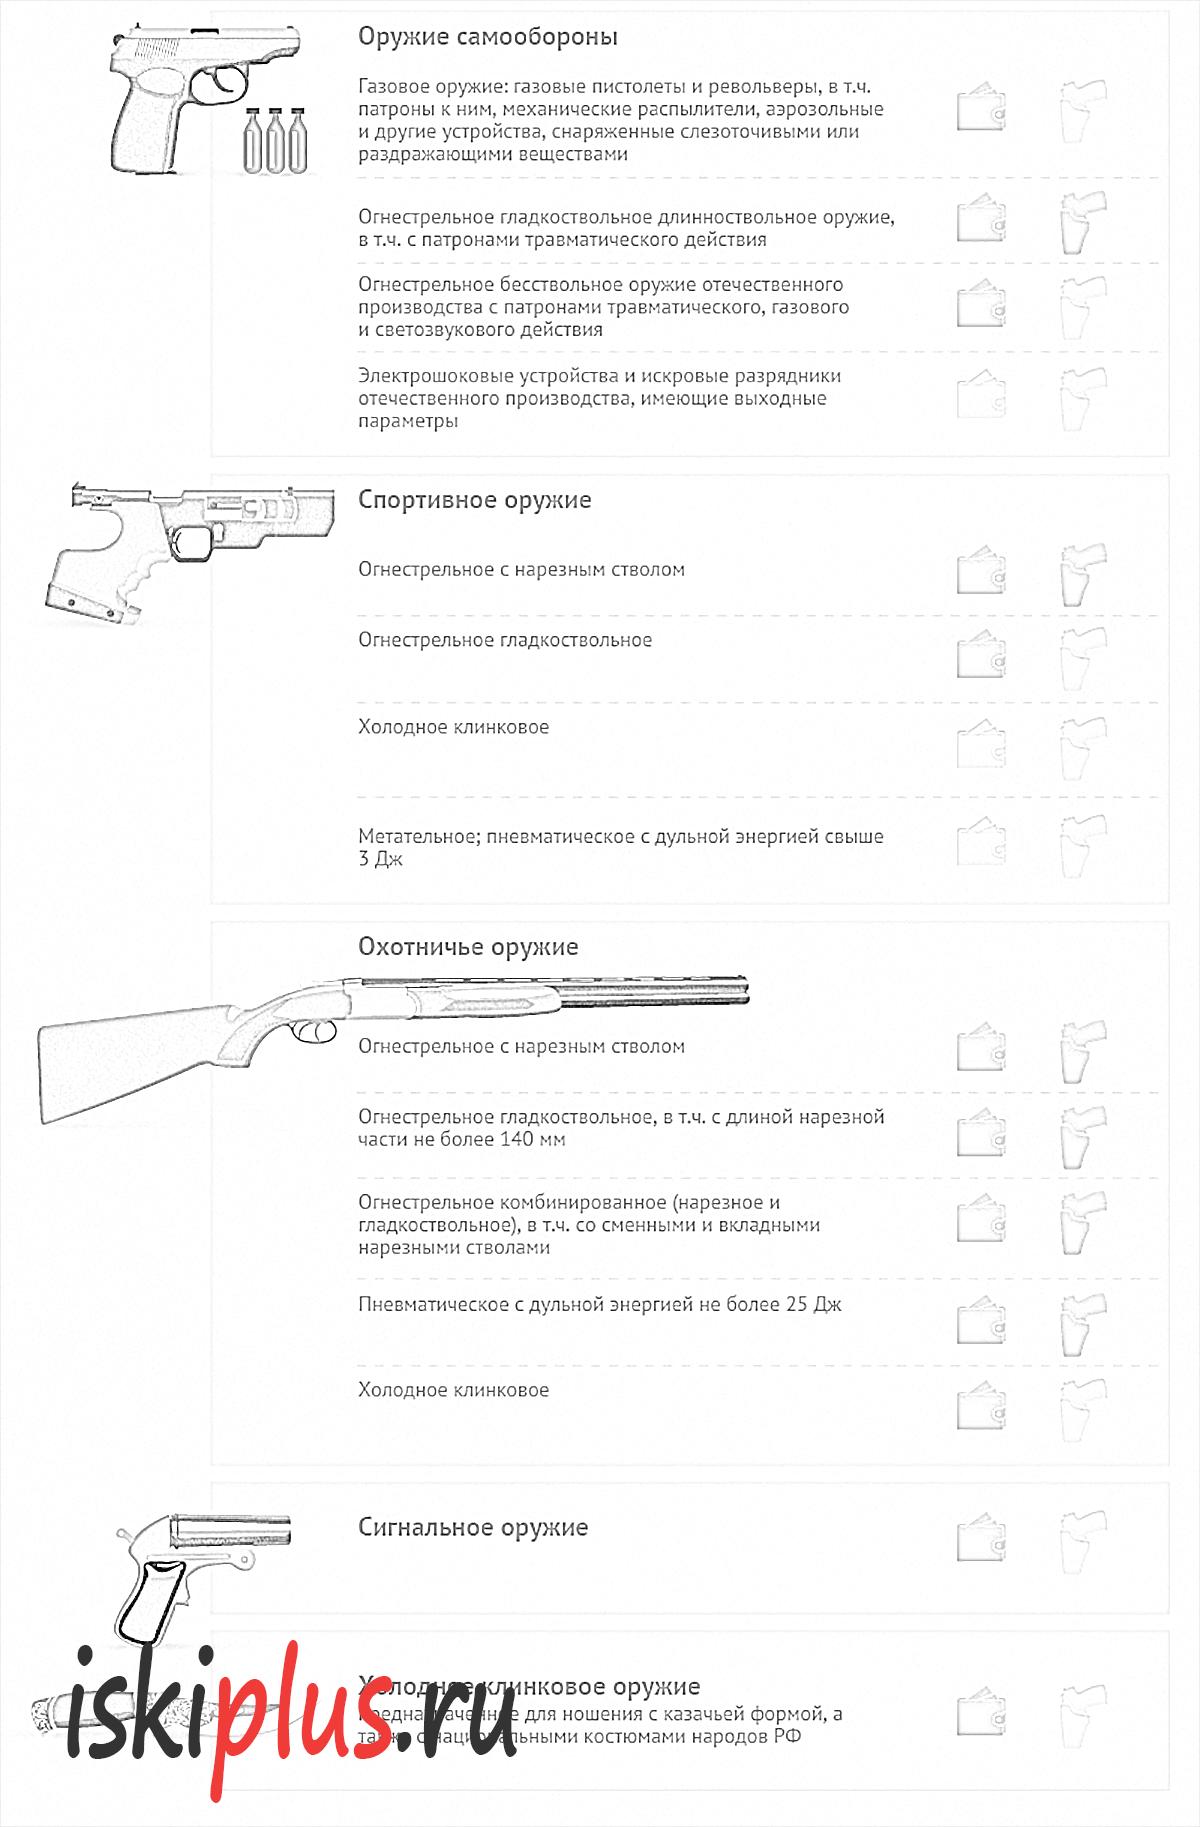 Разрешение на приобретение оружия